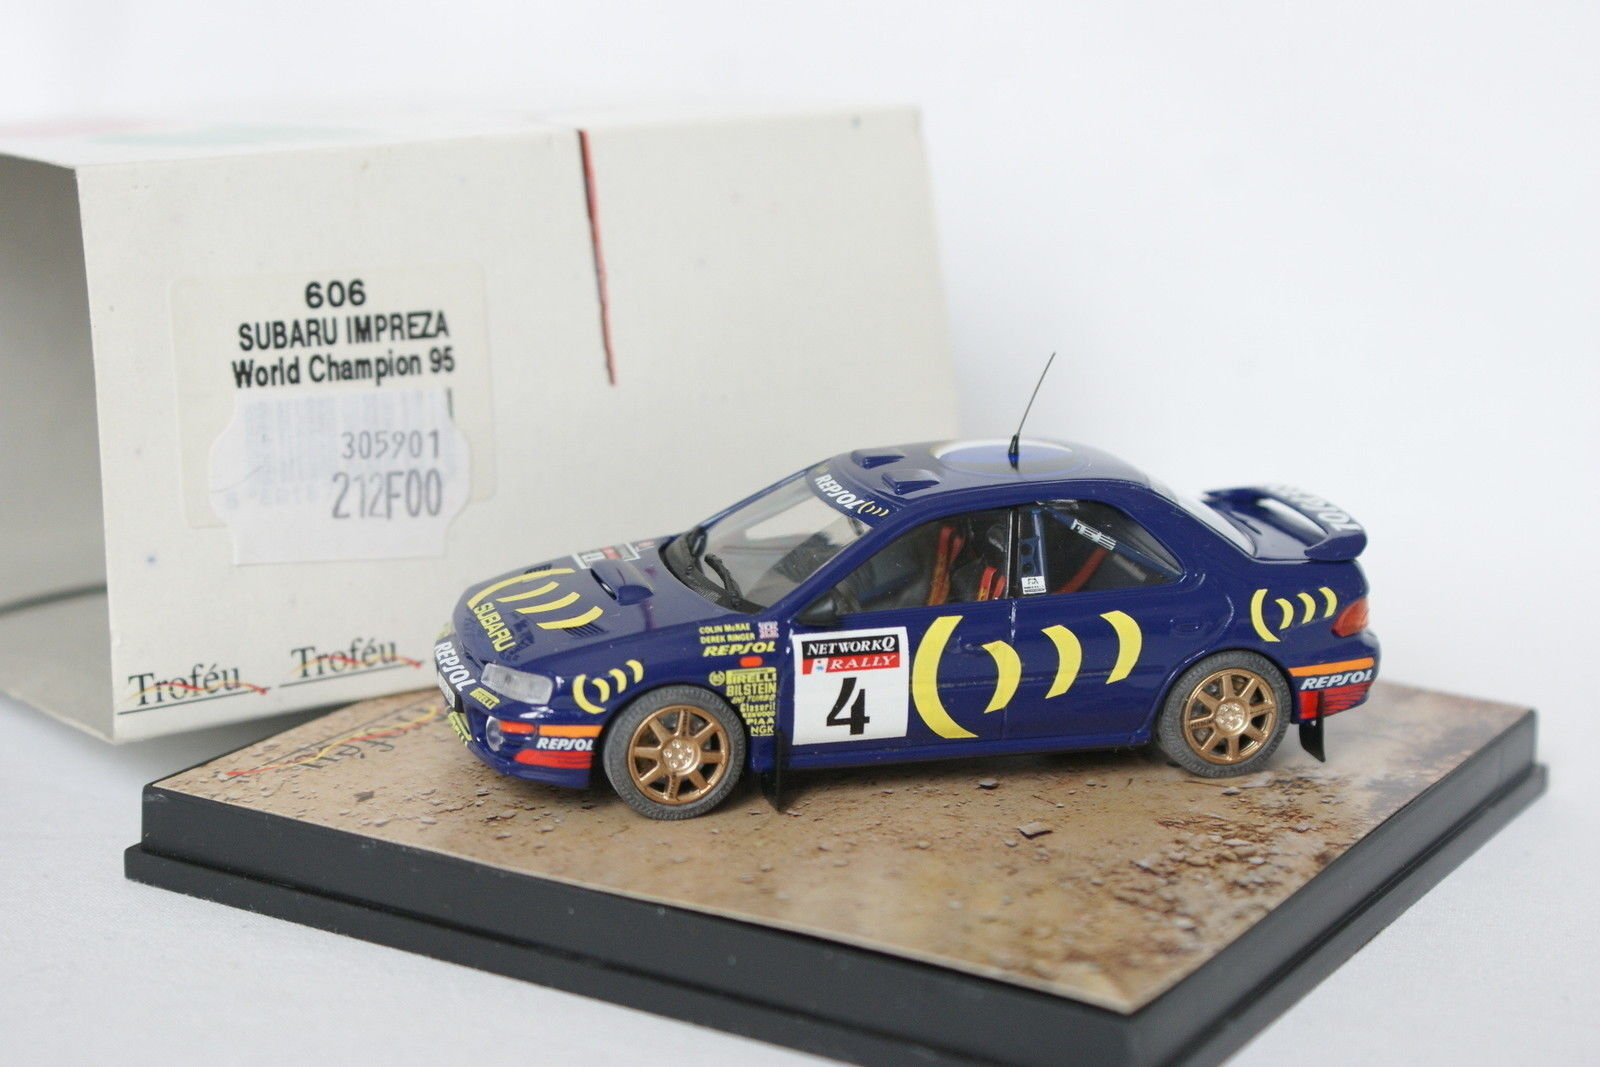 Trofeu 1 43 - Subaru Impreza World Champion 1995